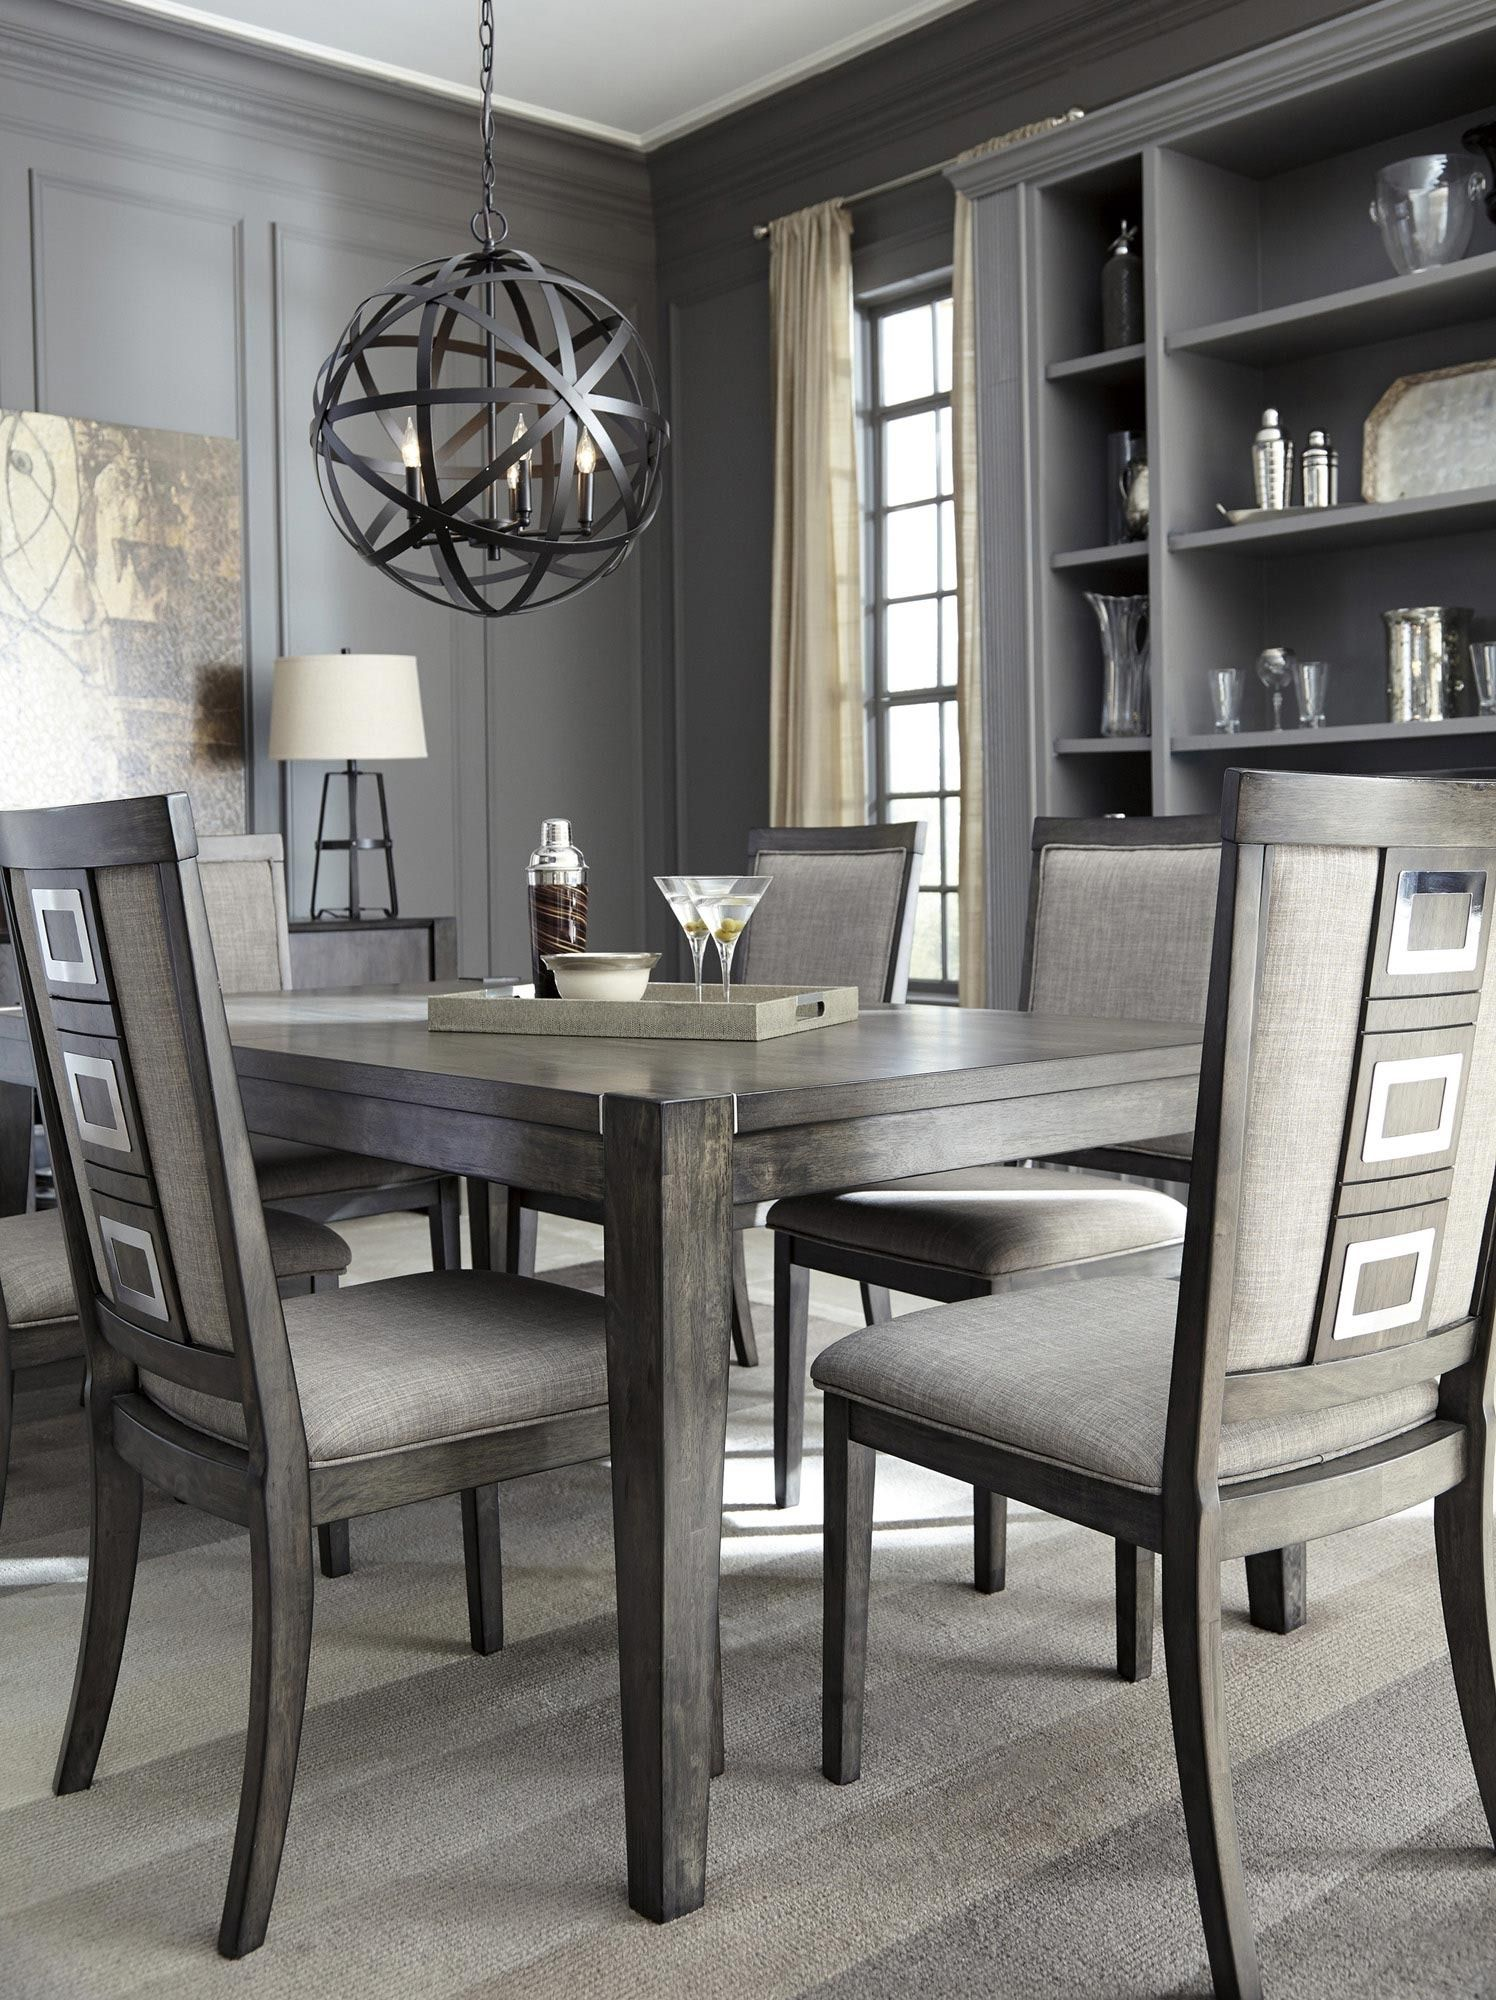 Chadoni Gray Rectangular Extendable Dining Table Grey Dining Room Table Grey Dining Tables Grey Dining Room